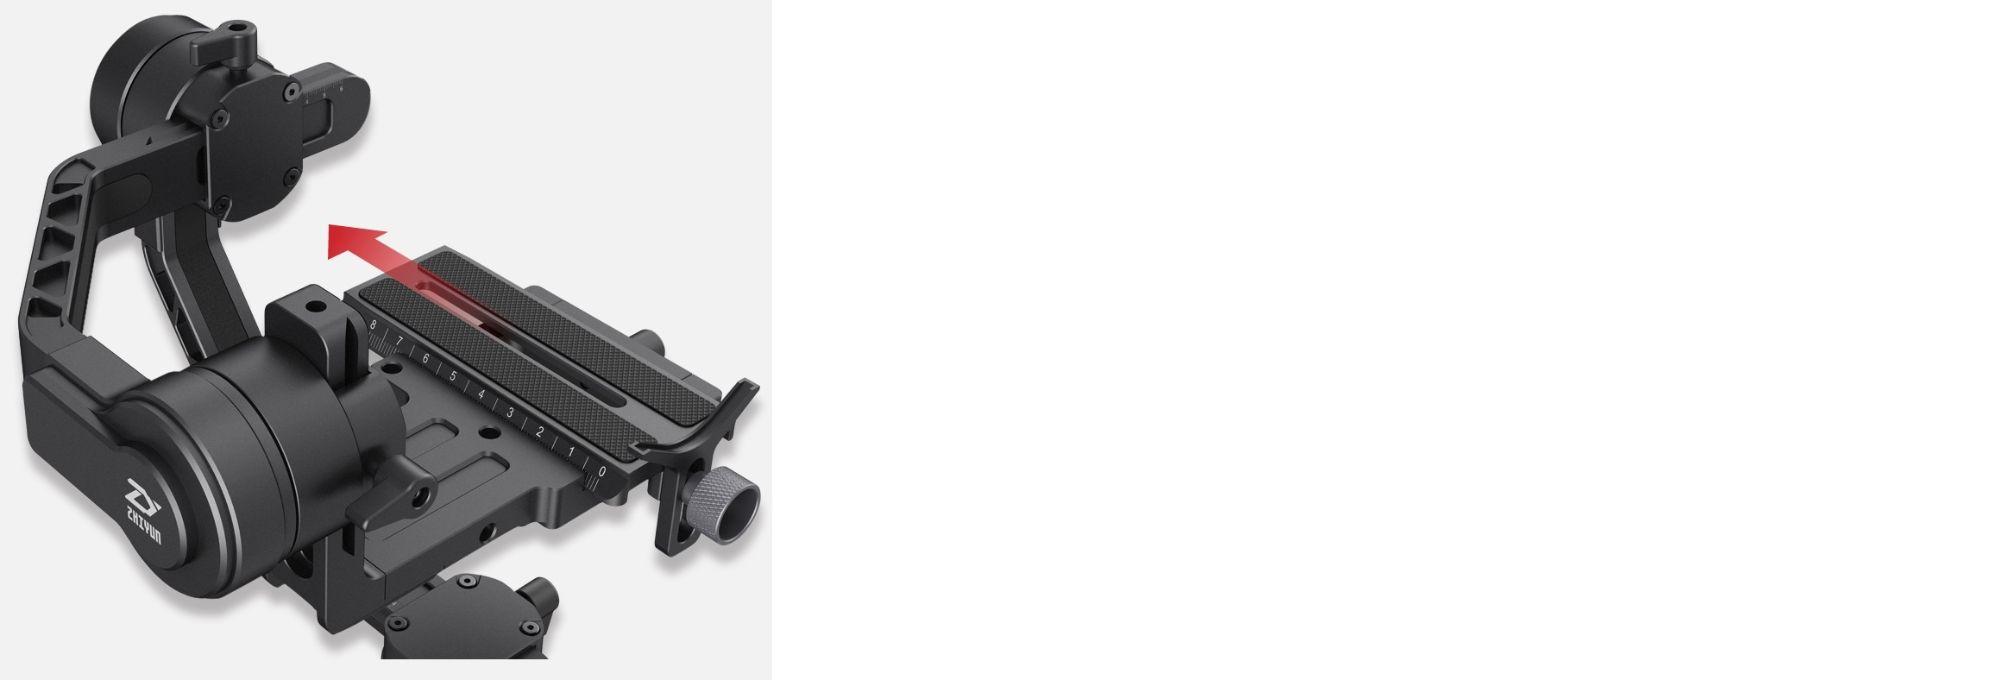 Zhiyun Crane 2 Handheld 3-Axis Gimbal with Follow Focus_image_7|Rakuten